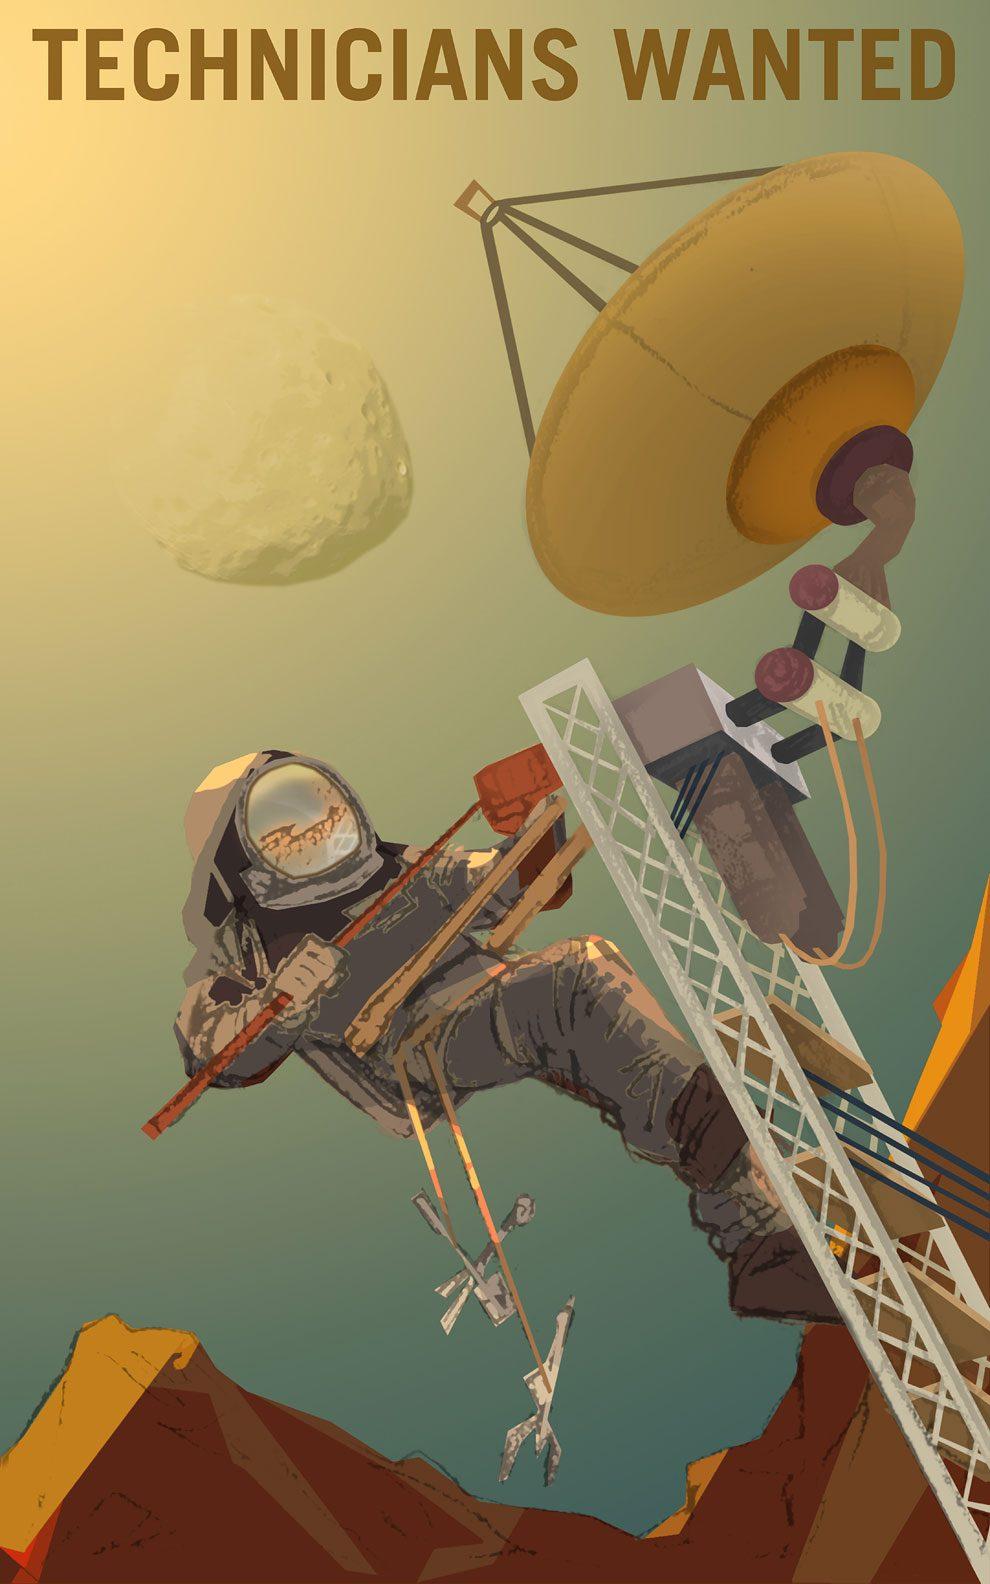 P06-Technicians-Wanted-NASA-Recruitment-Poster